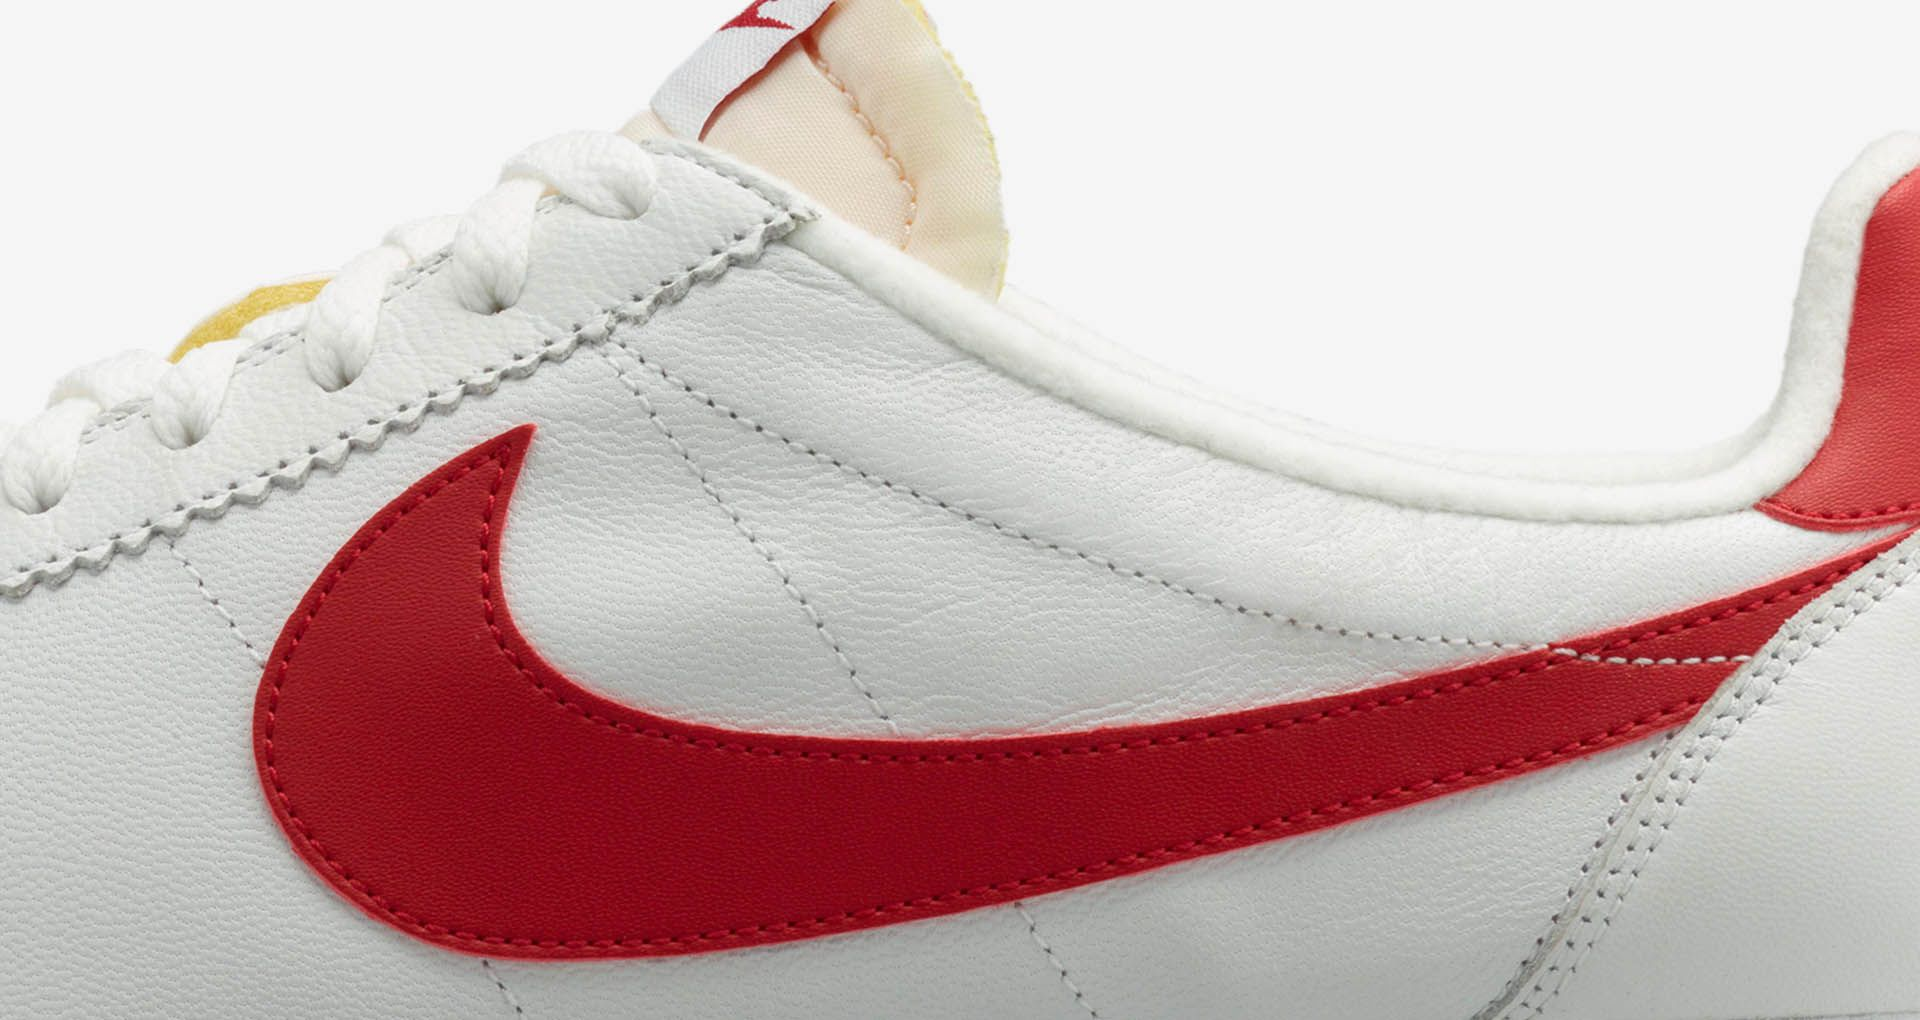 Nike Classic Cortez 'Always Ahead'. Nike SNKRS